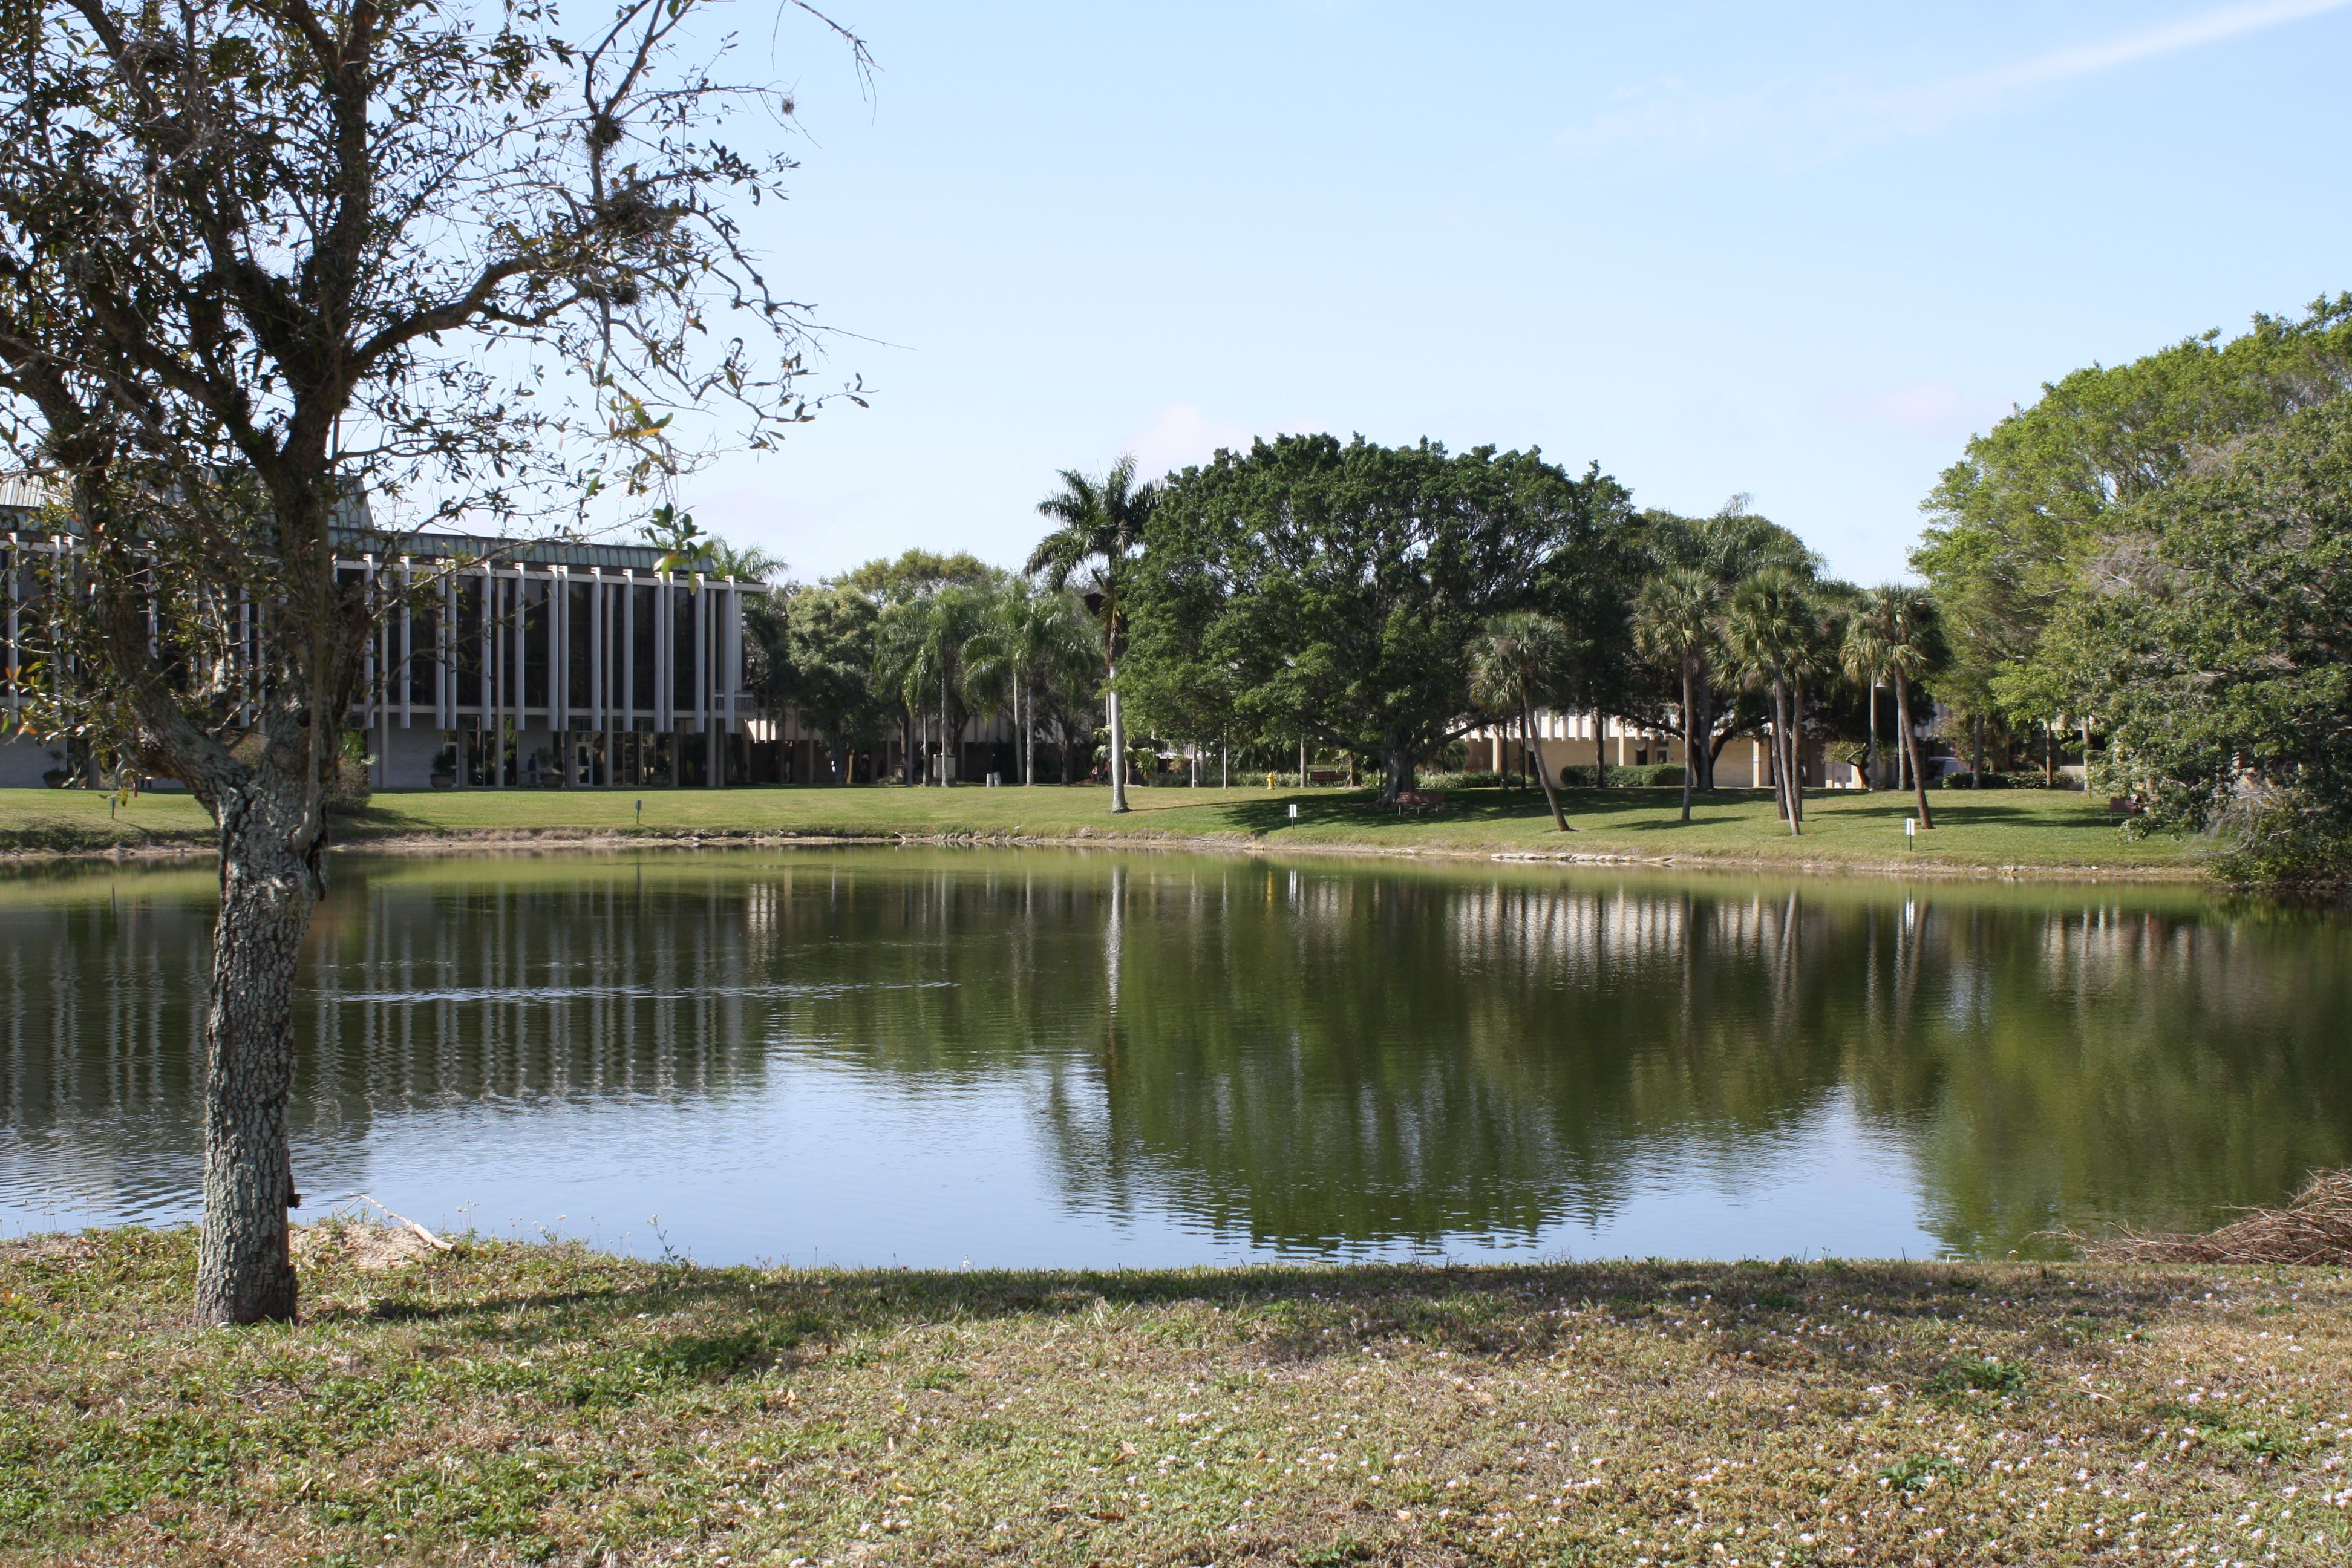 Pond on Thomas Edison campus | Campus, Pond, Life